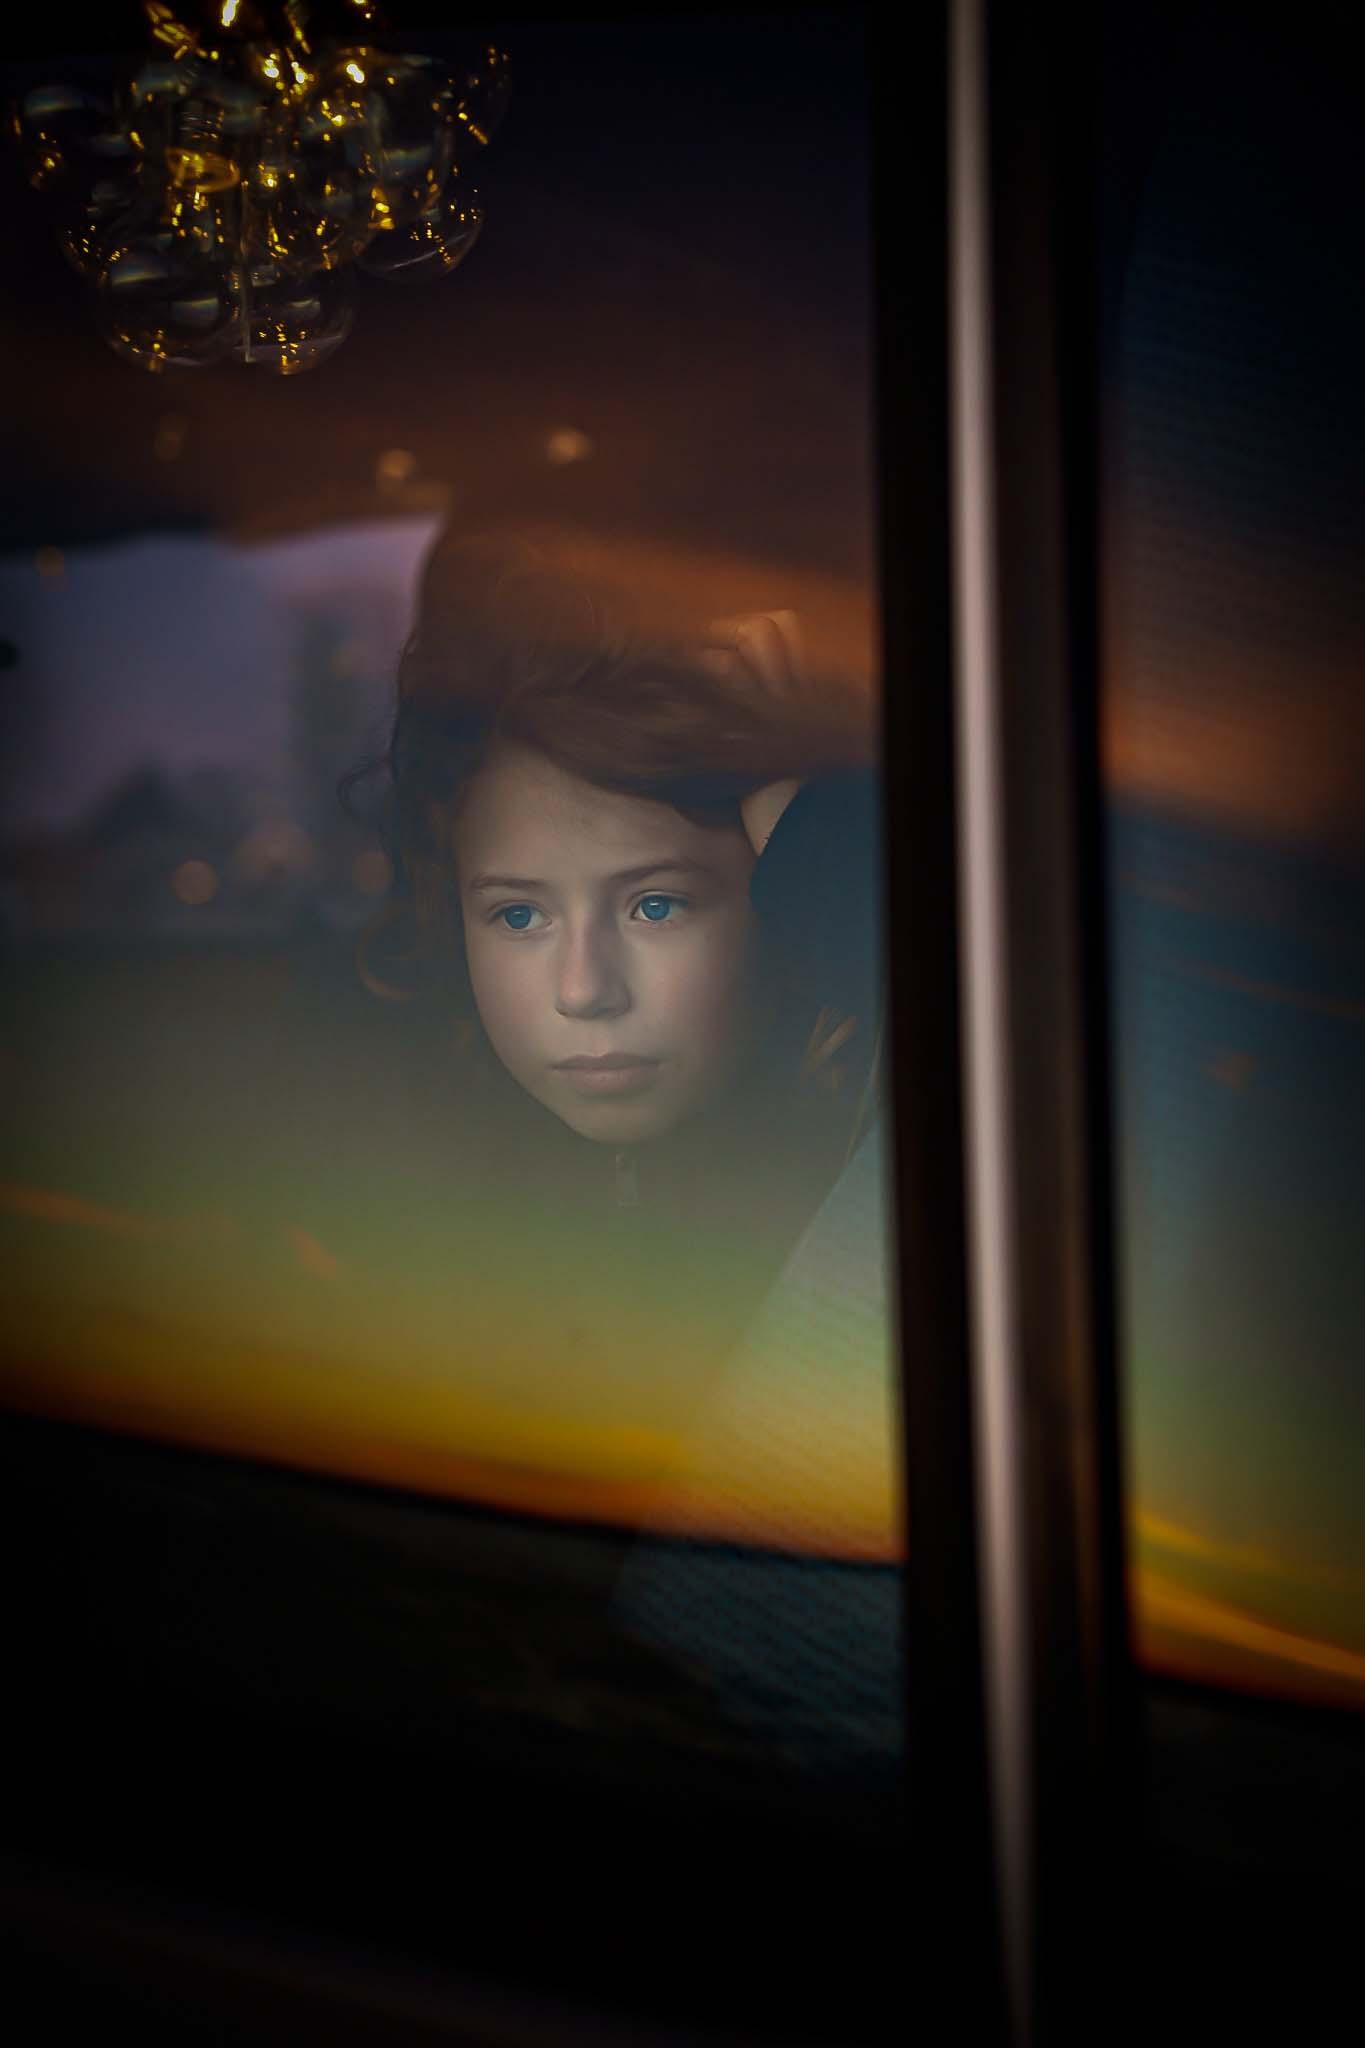 porträttfoto genom fönsterruta